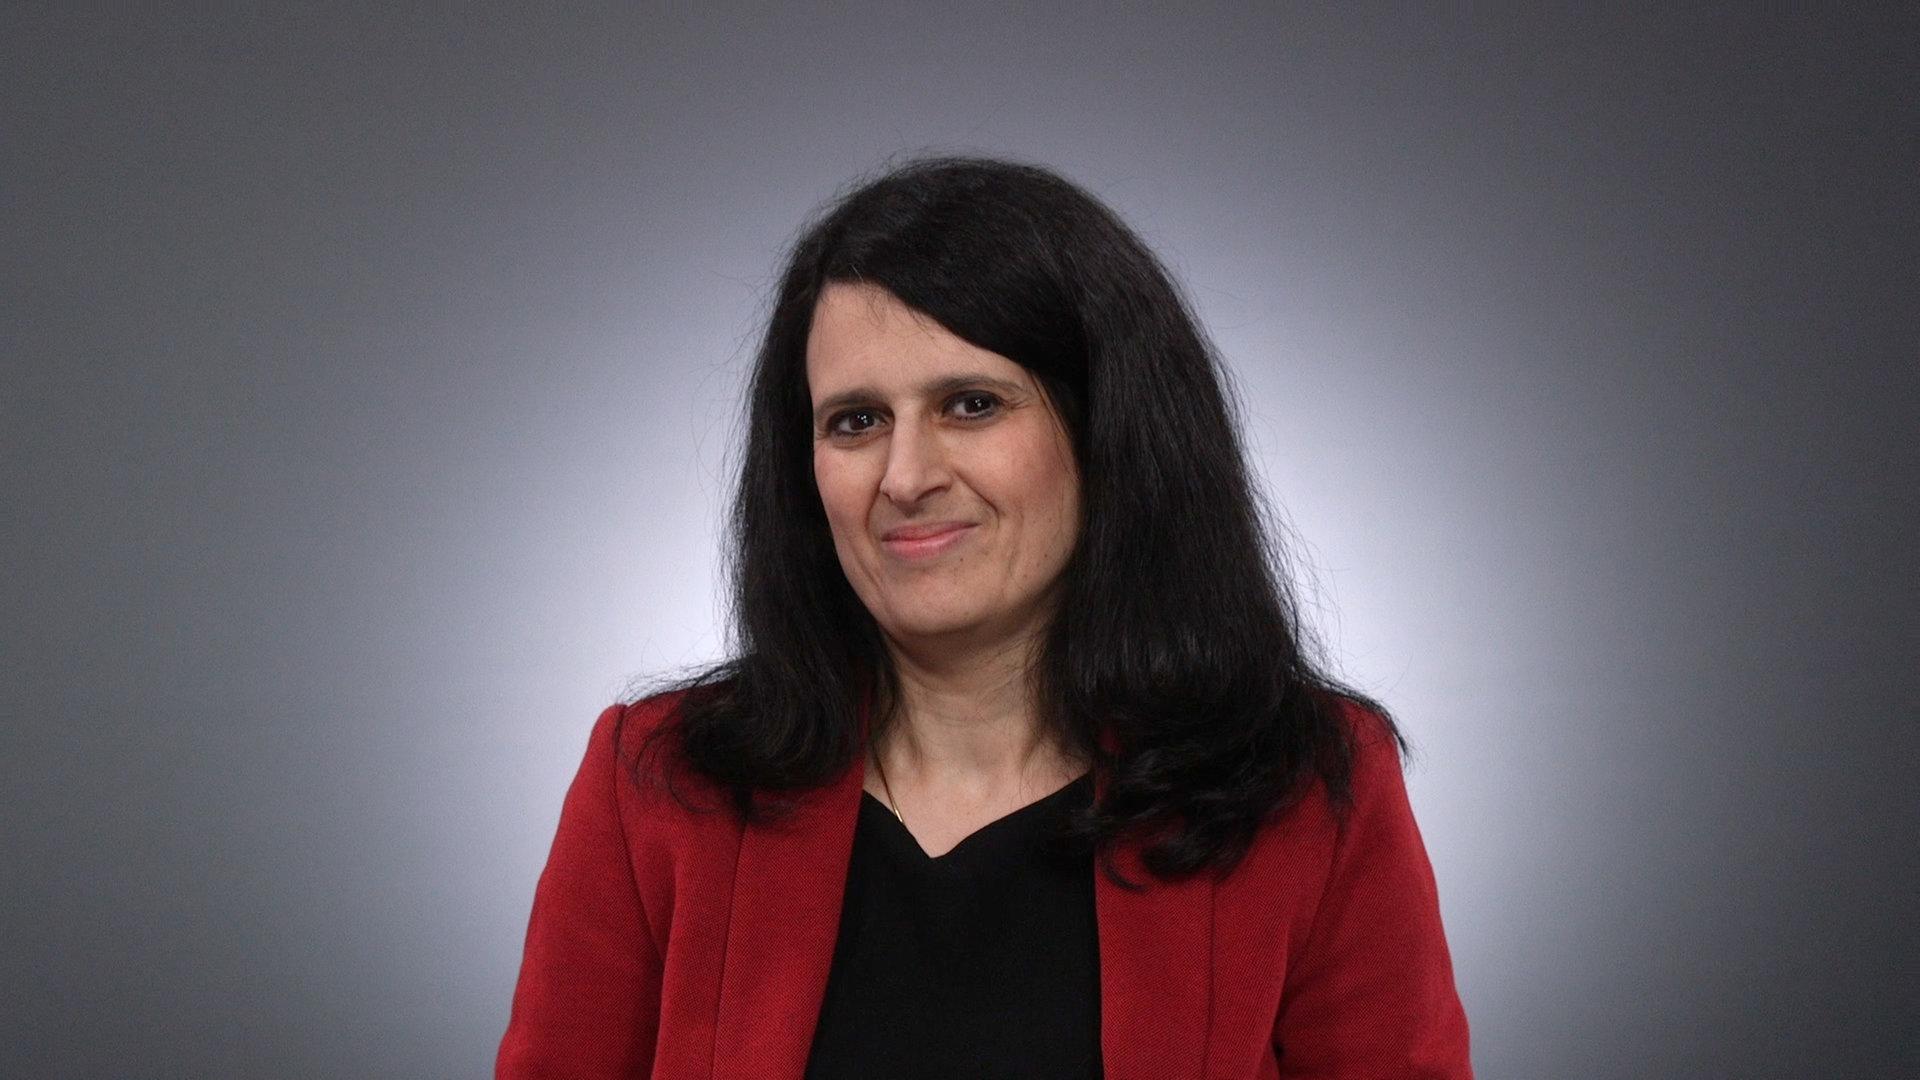 Eftichia Olowson-Saviolaki, SPD